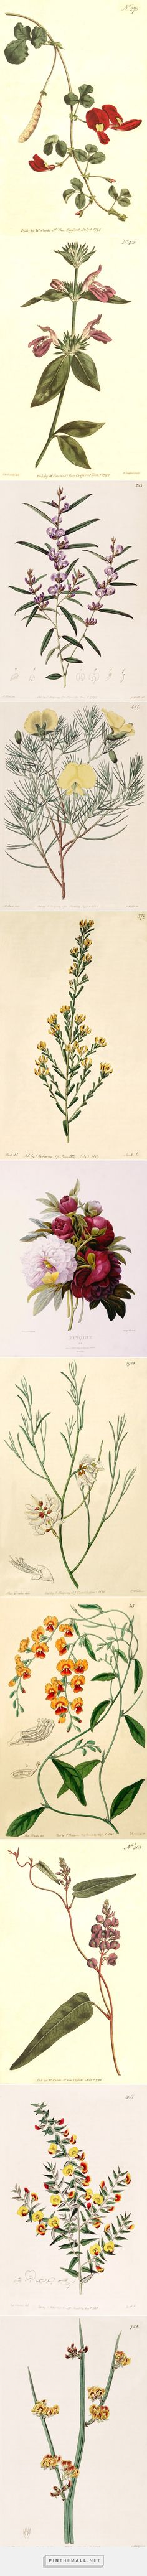 Vintage Botanical Illustrations // Pierre Joseph Redouté. He's one of my favorites.